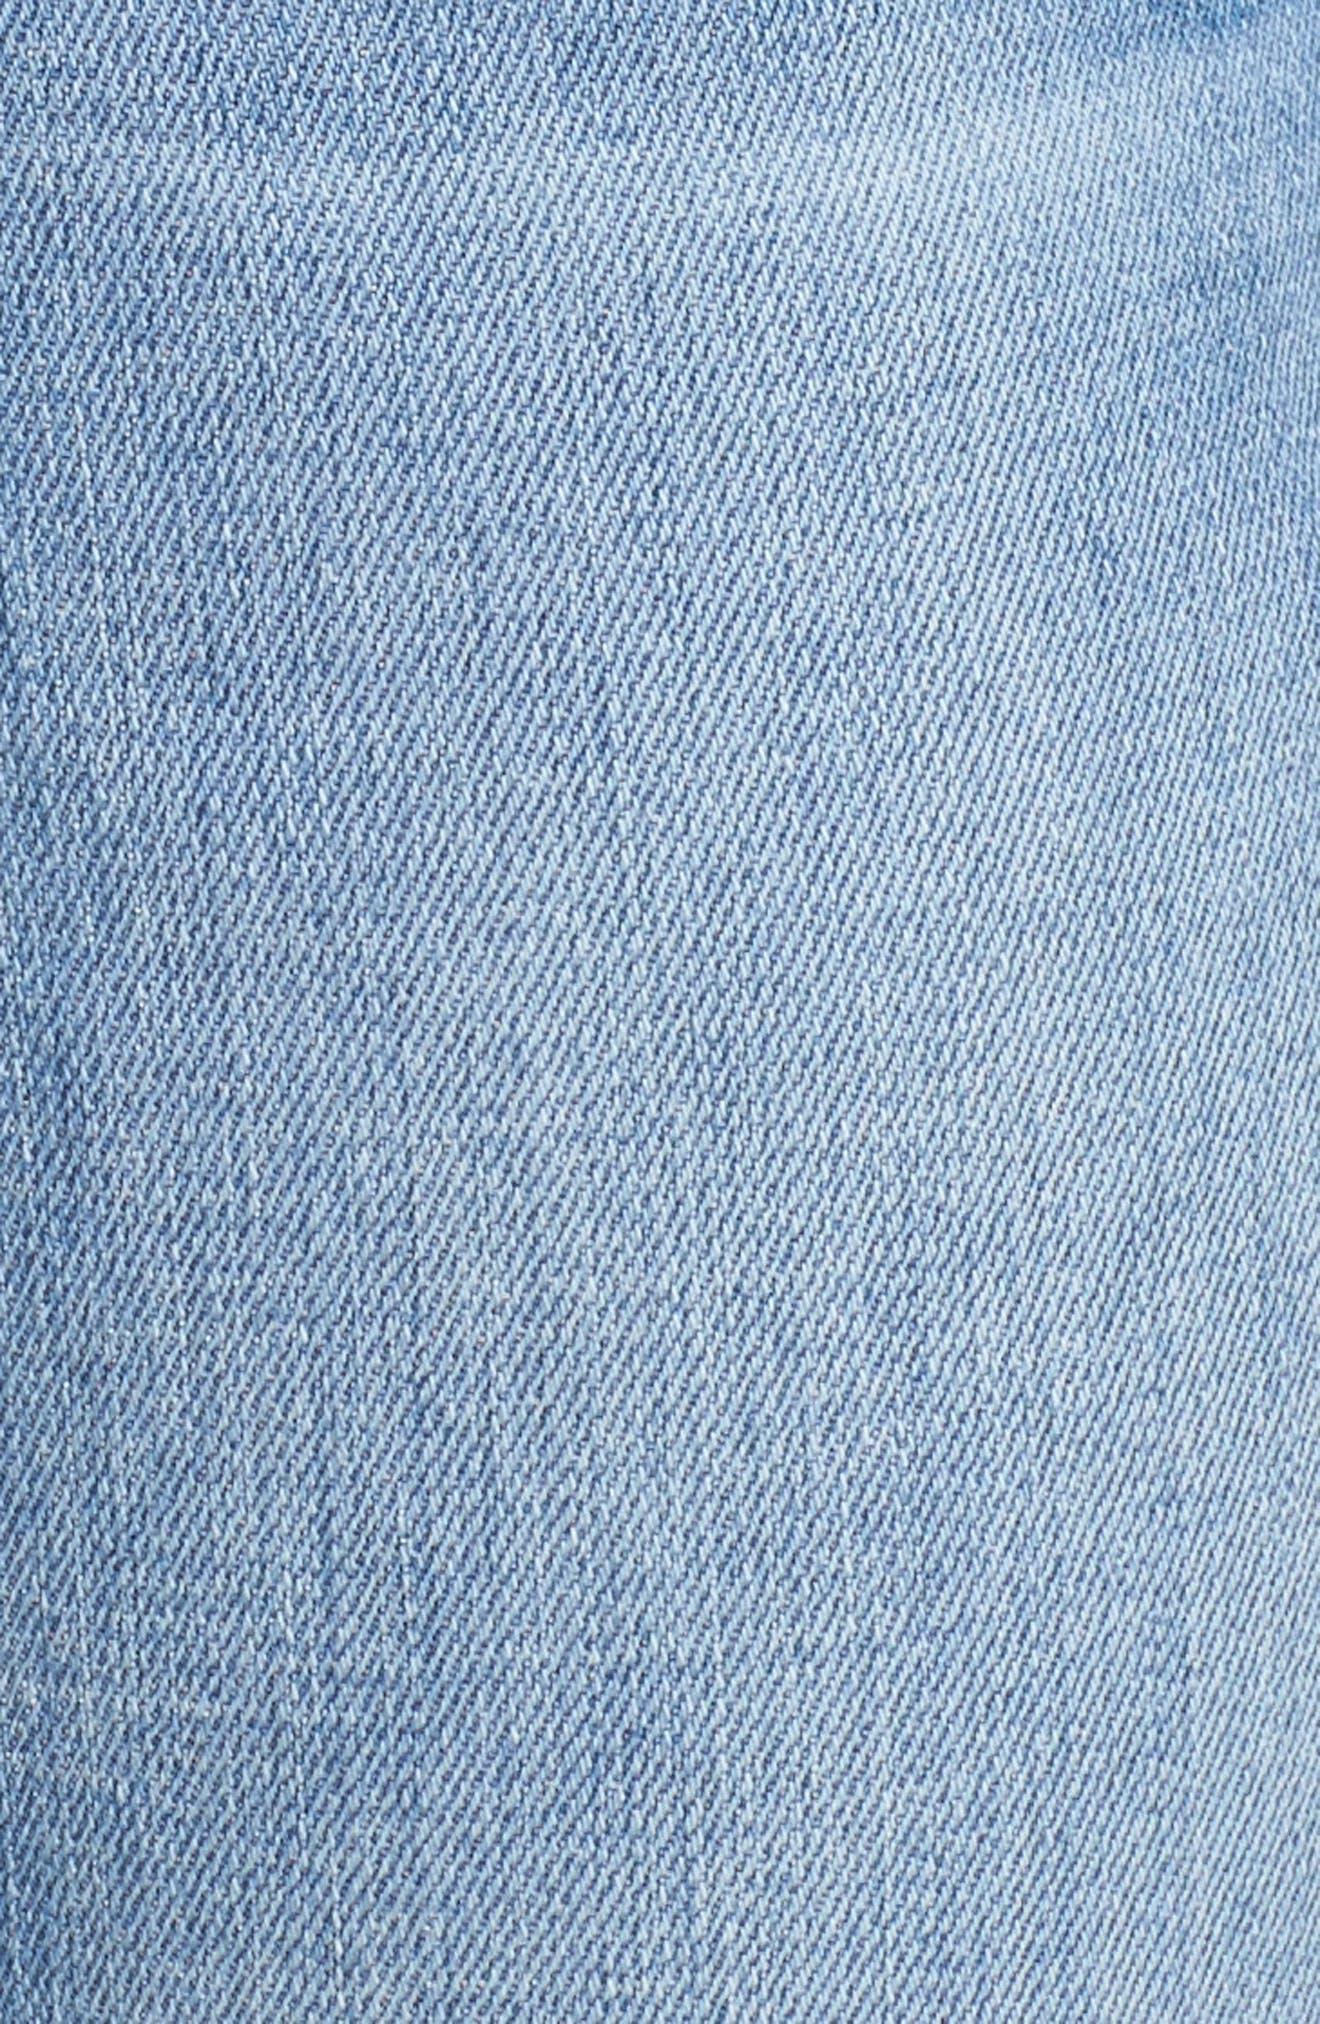 Edie High Waist Crop Release Hem Jeans,                             Alternate thumbnail 5, color,                             400